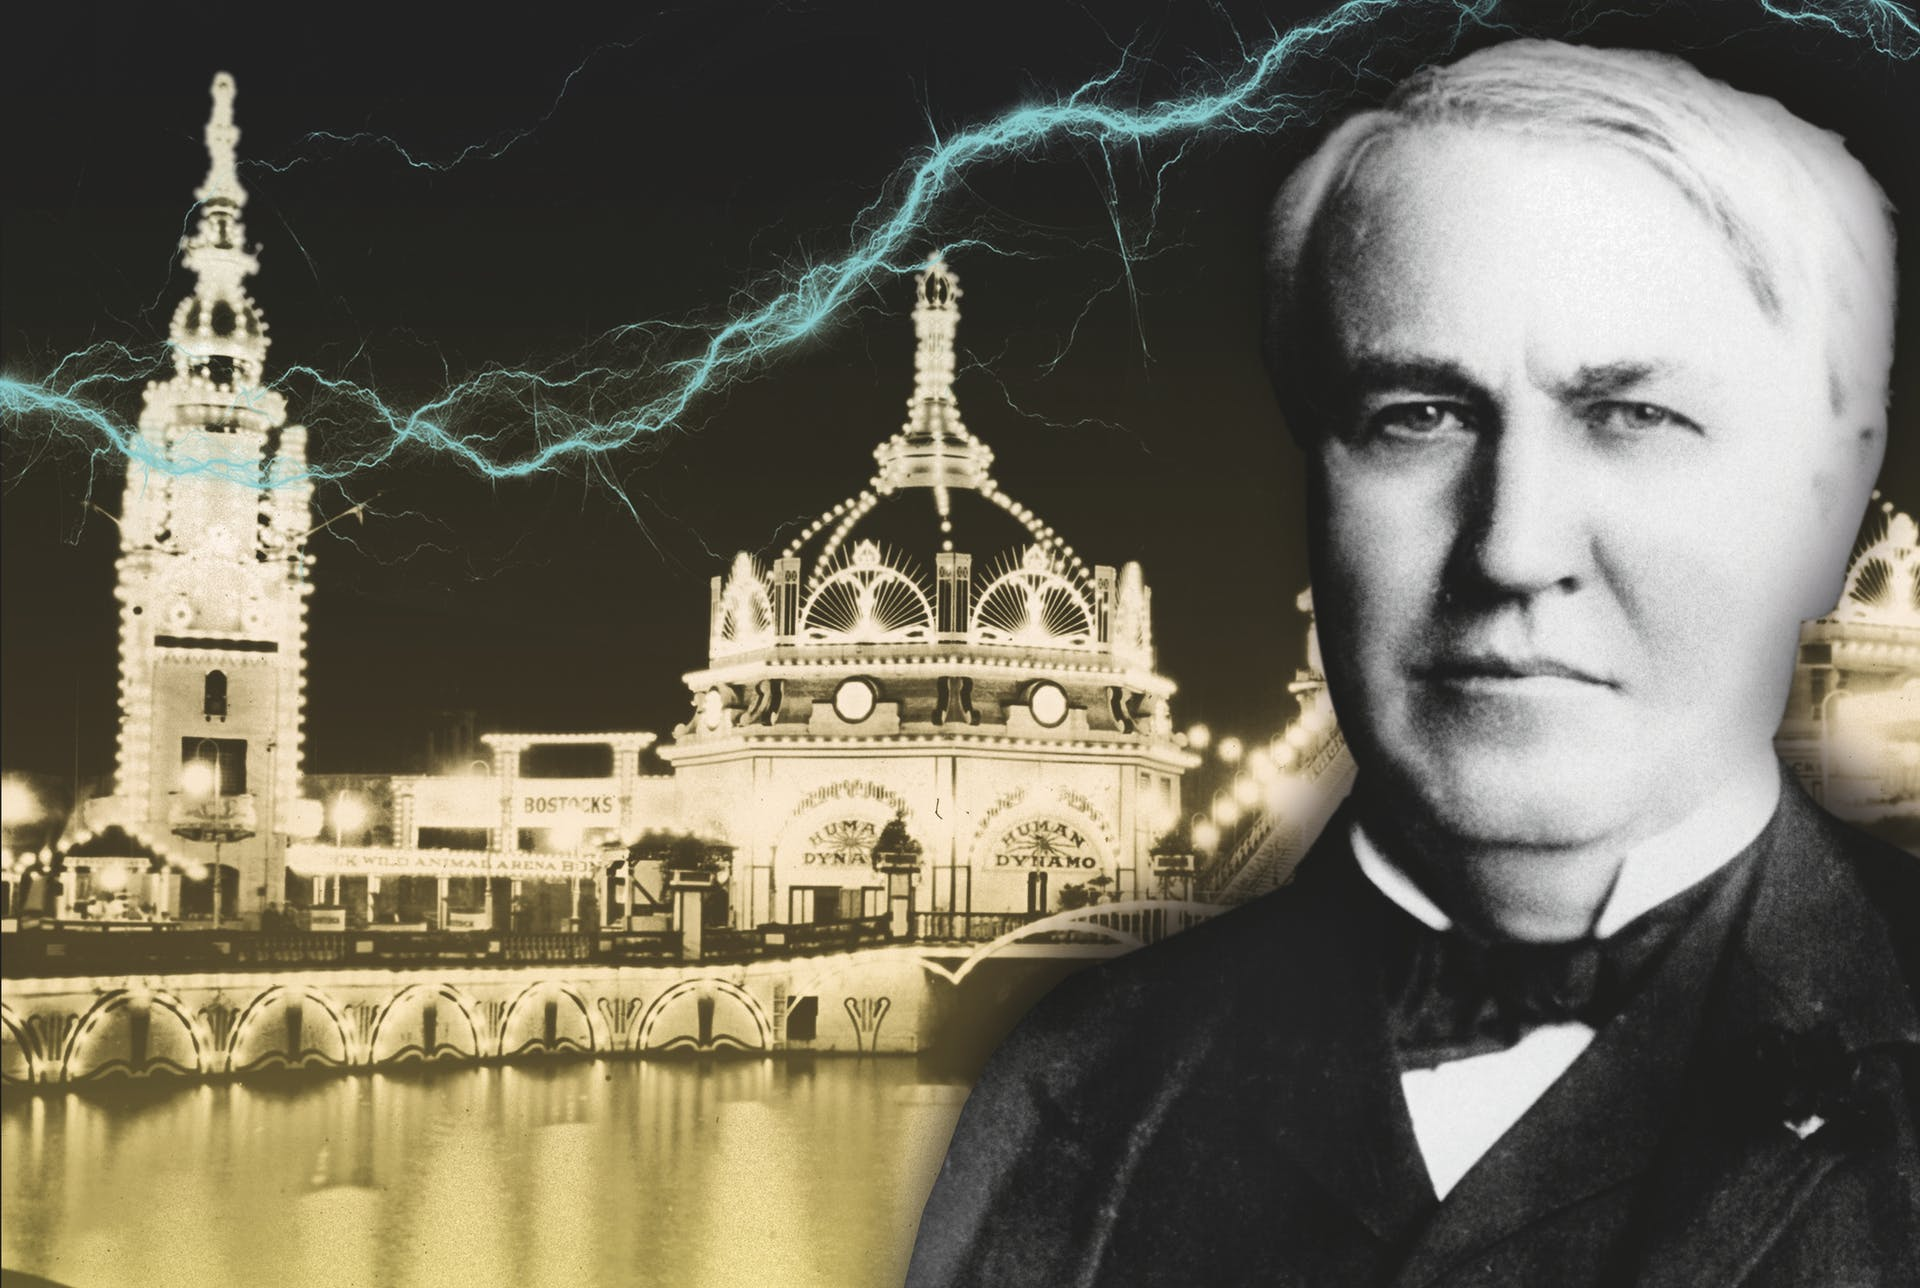 Edison Ging Tegen De Stroom In Historianetnl